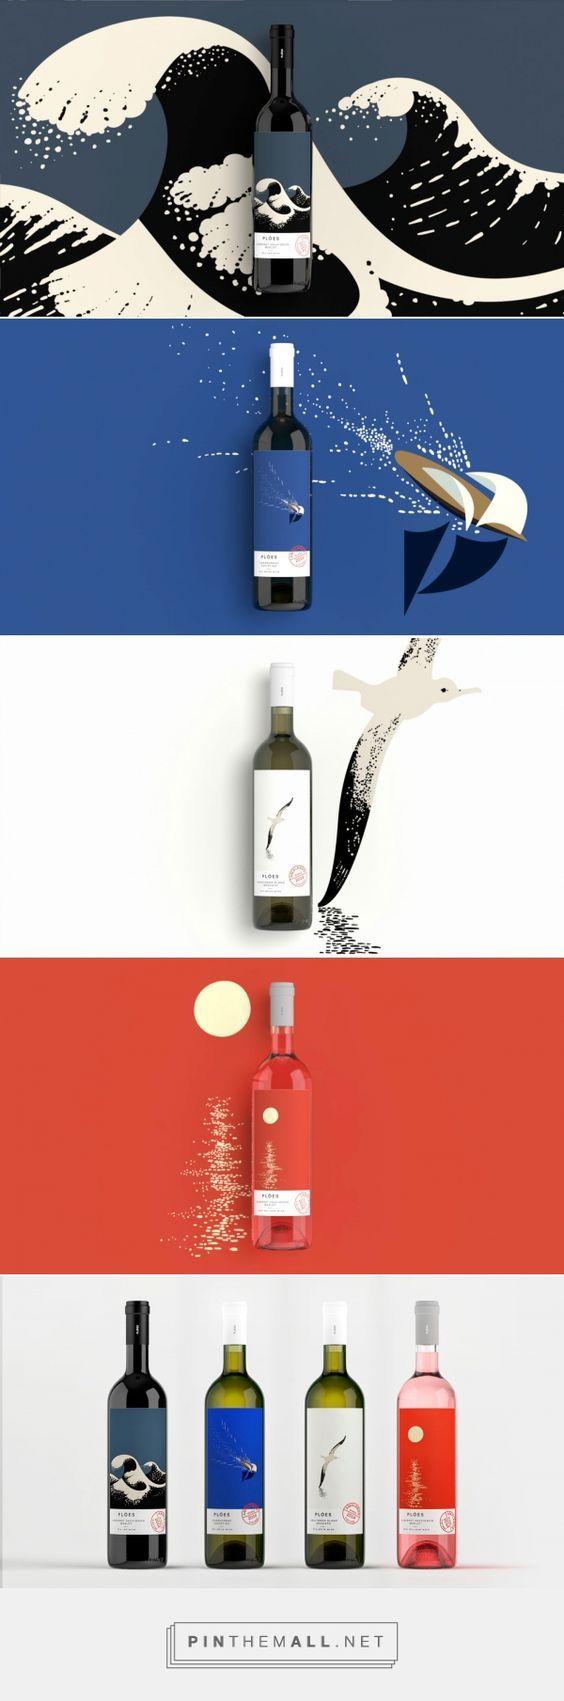 Ploes Wine Packaging By Beetroot Design Group Fivestar Branding Agency Design And Branding Agency Graphic Design Packaging Wine Design Wine Bottle Design